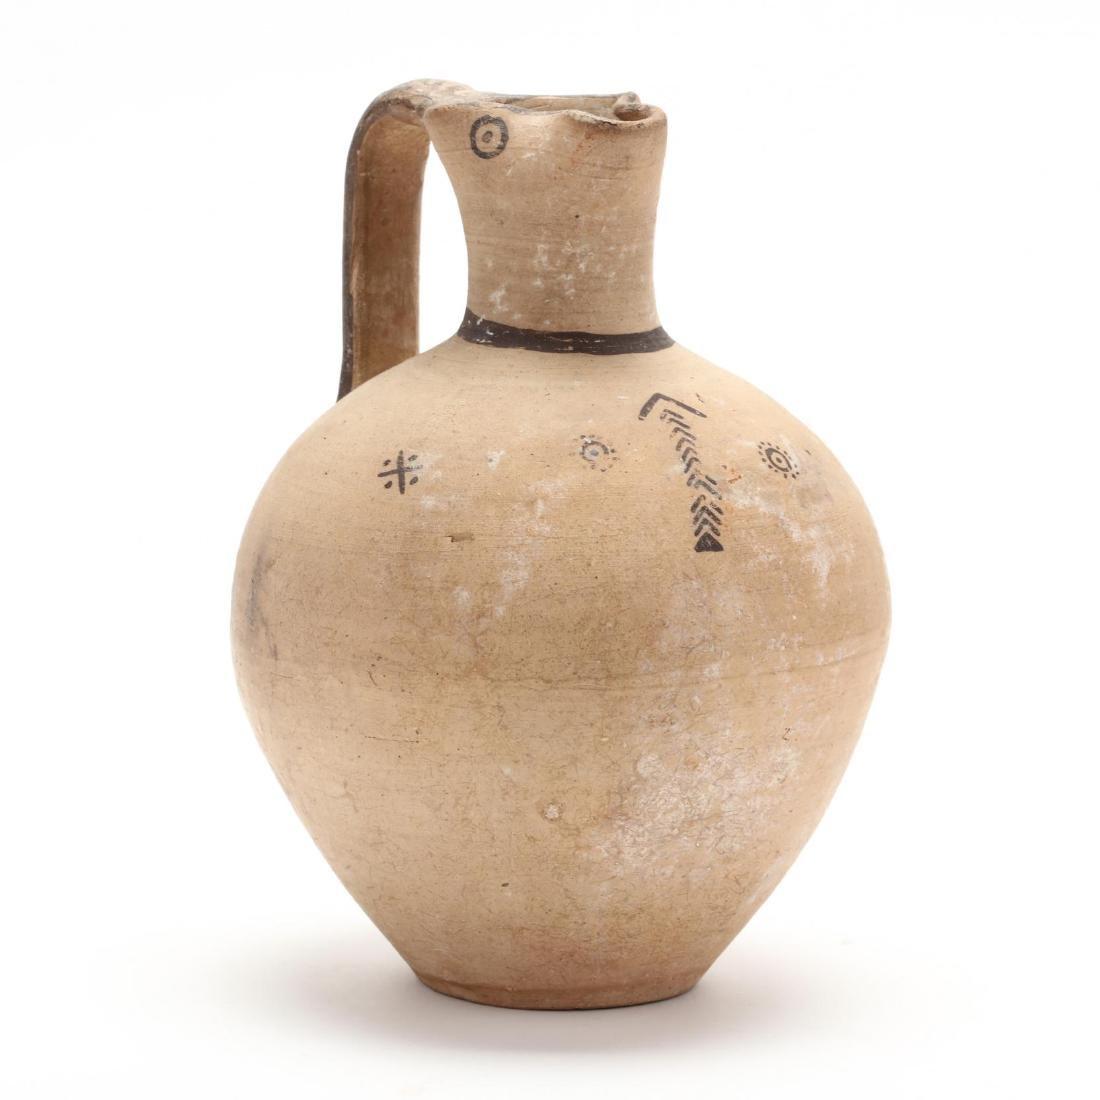 Cypro-Archaic White Ware Jug